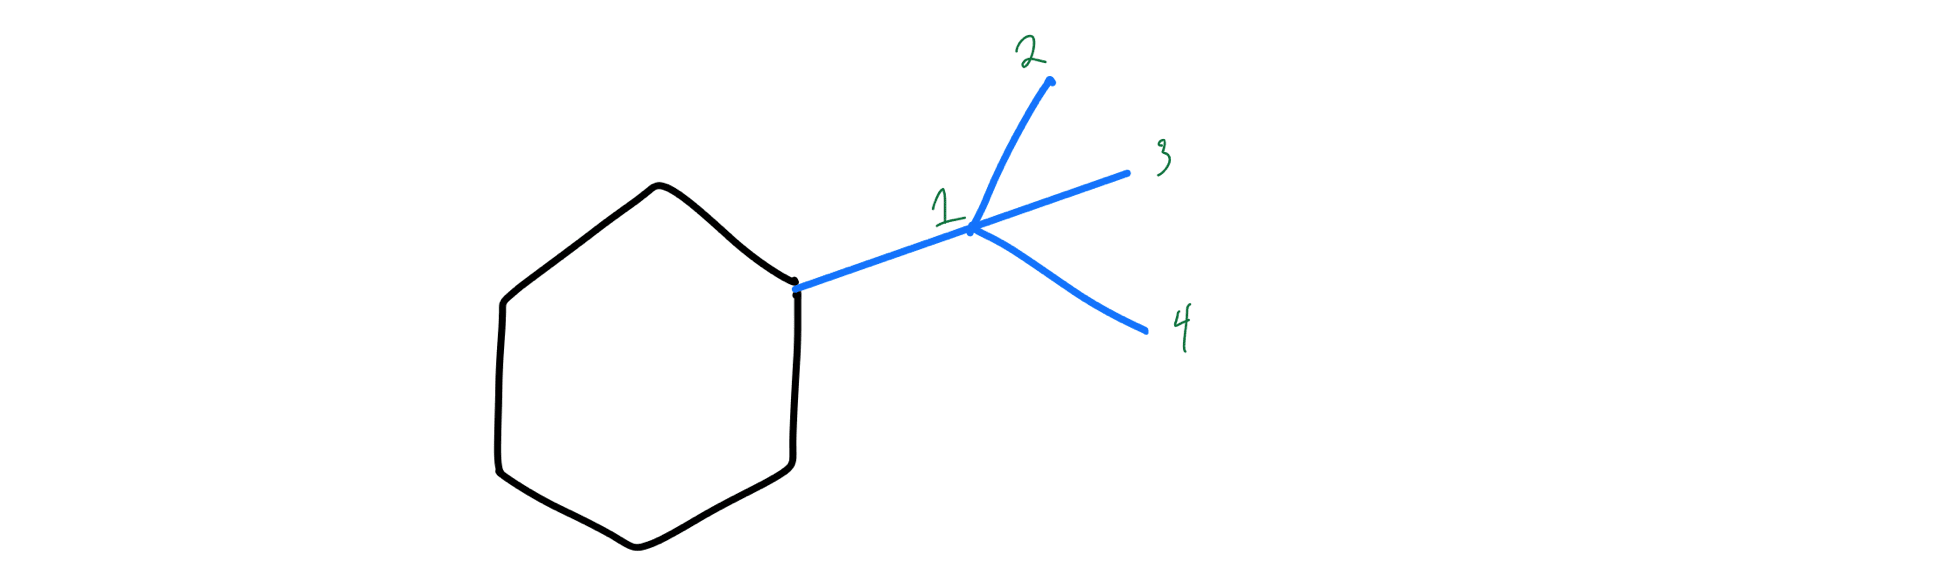 Tert-butyl